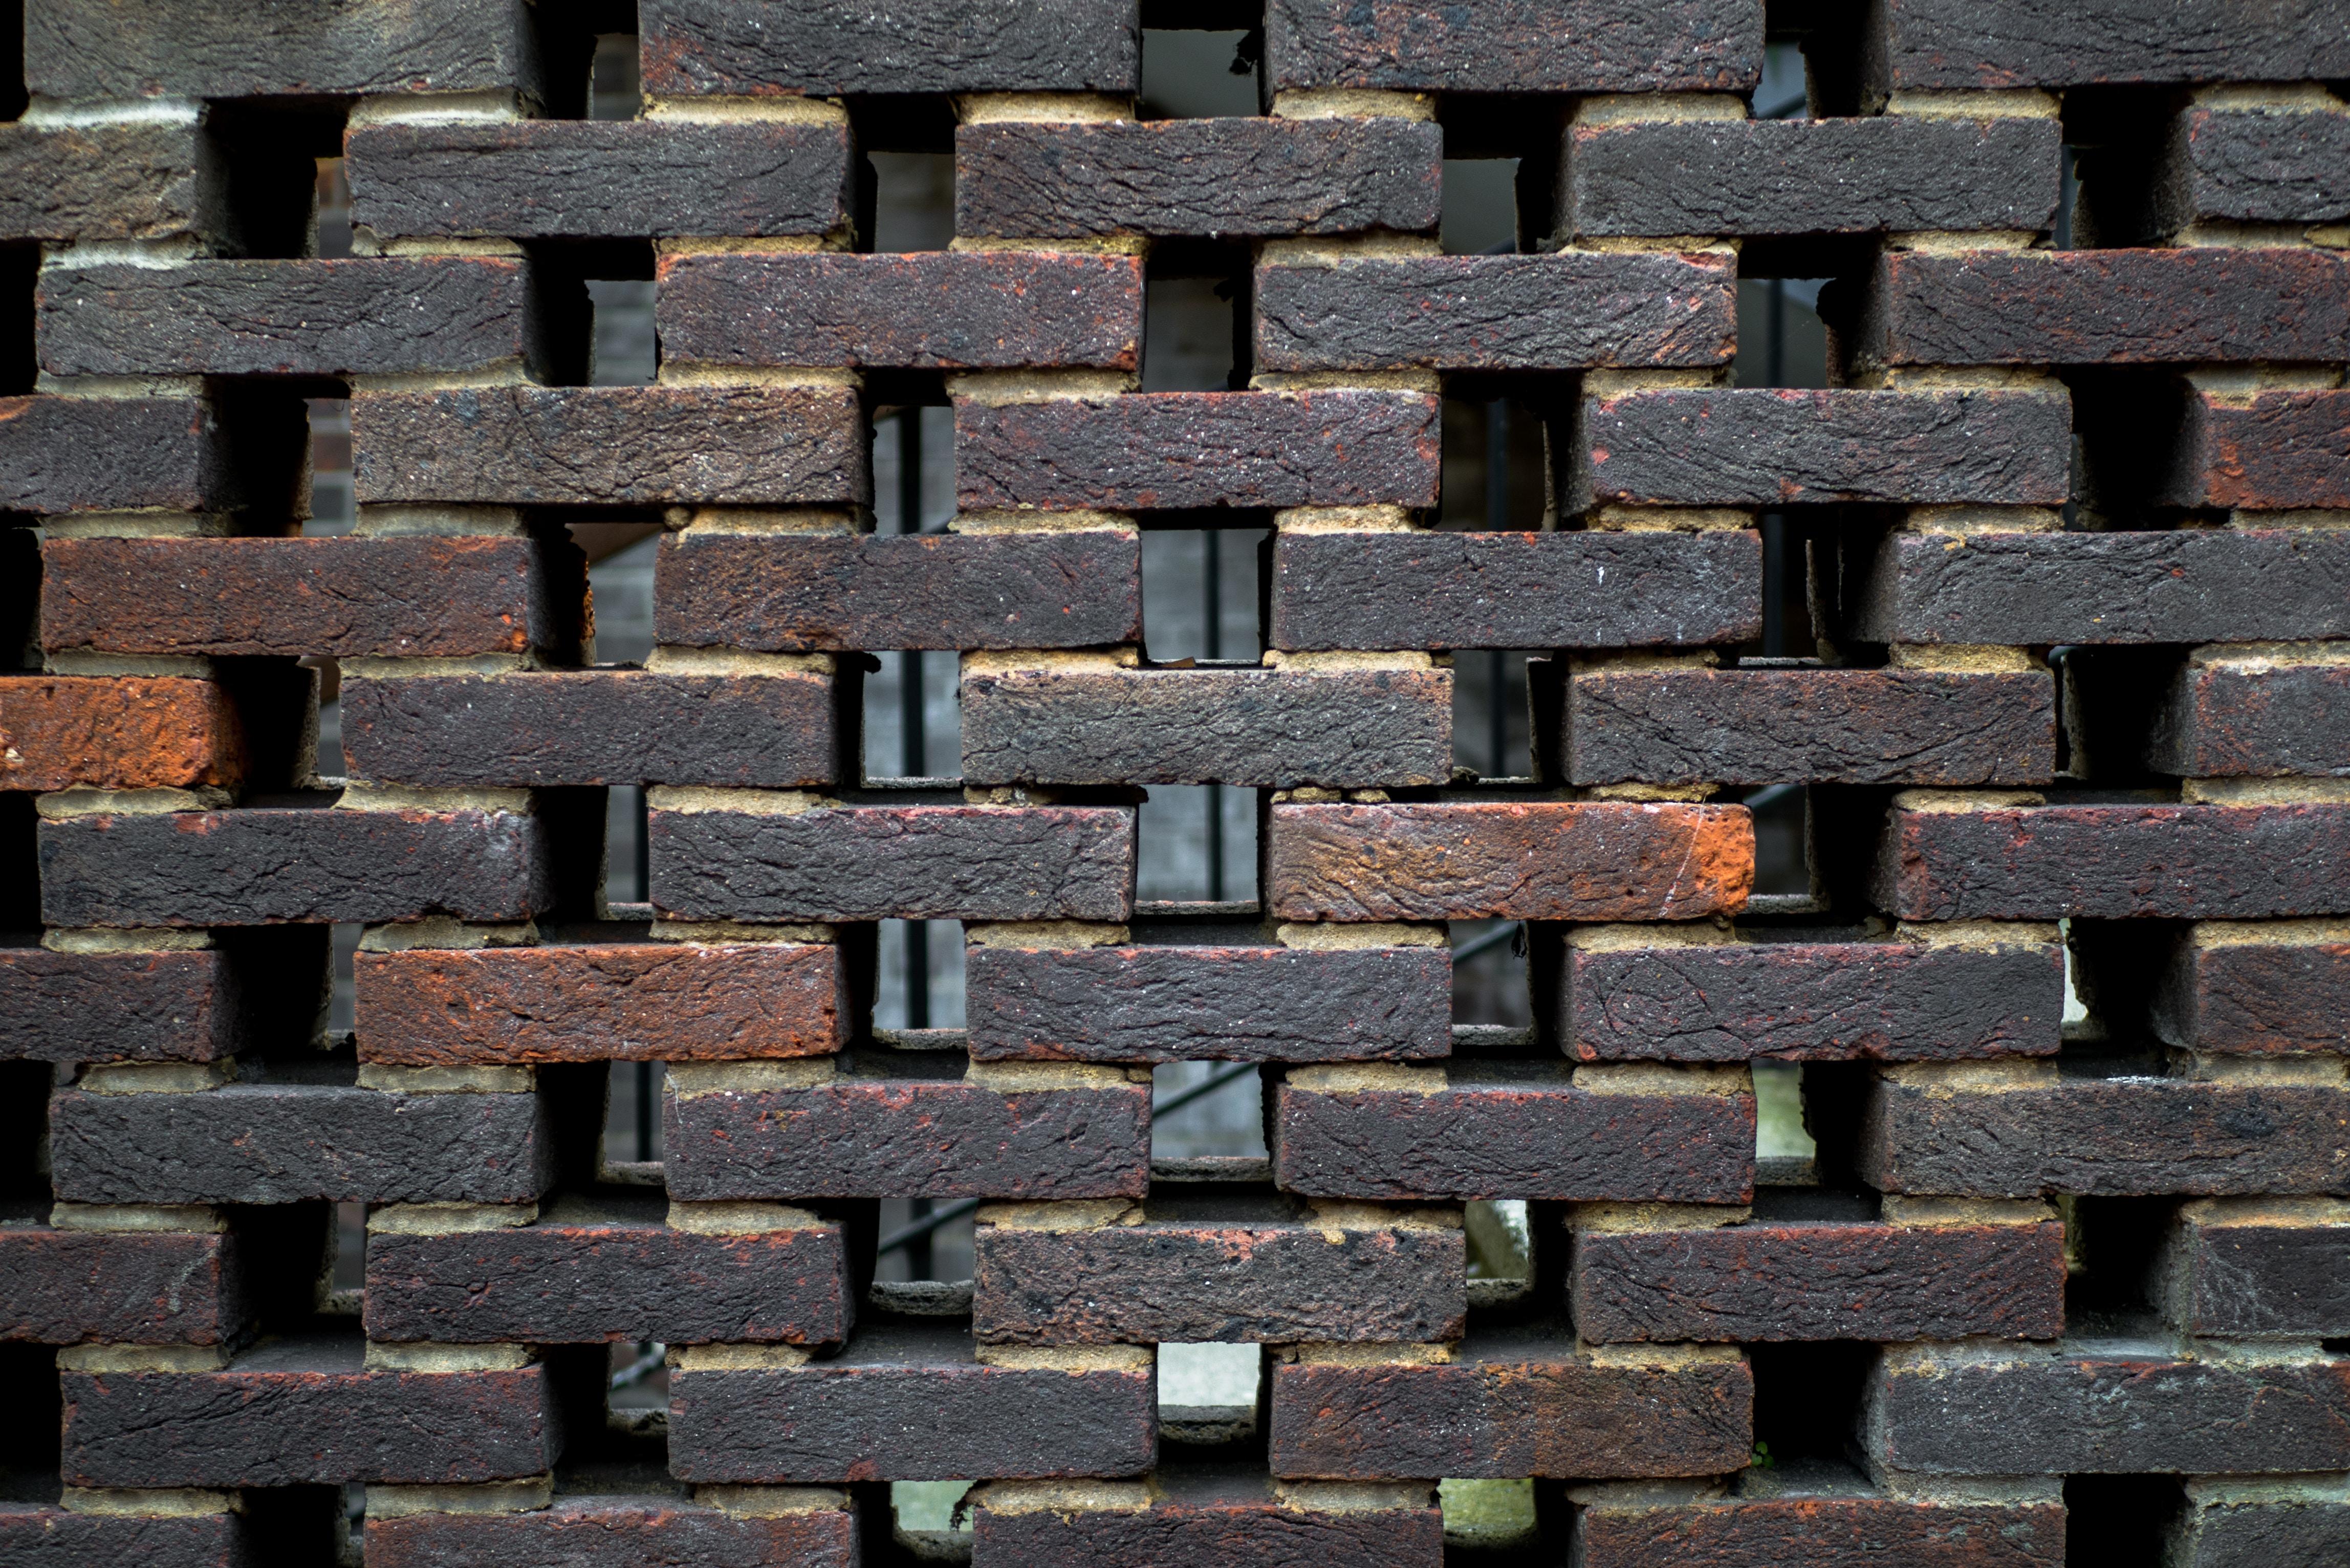 piled concrete bricks